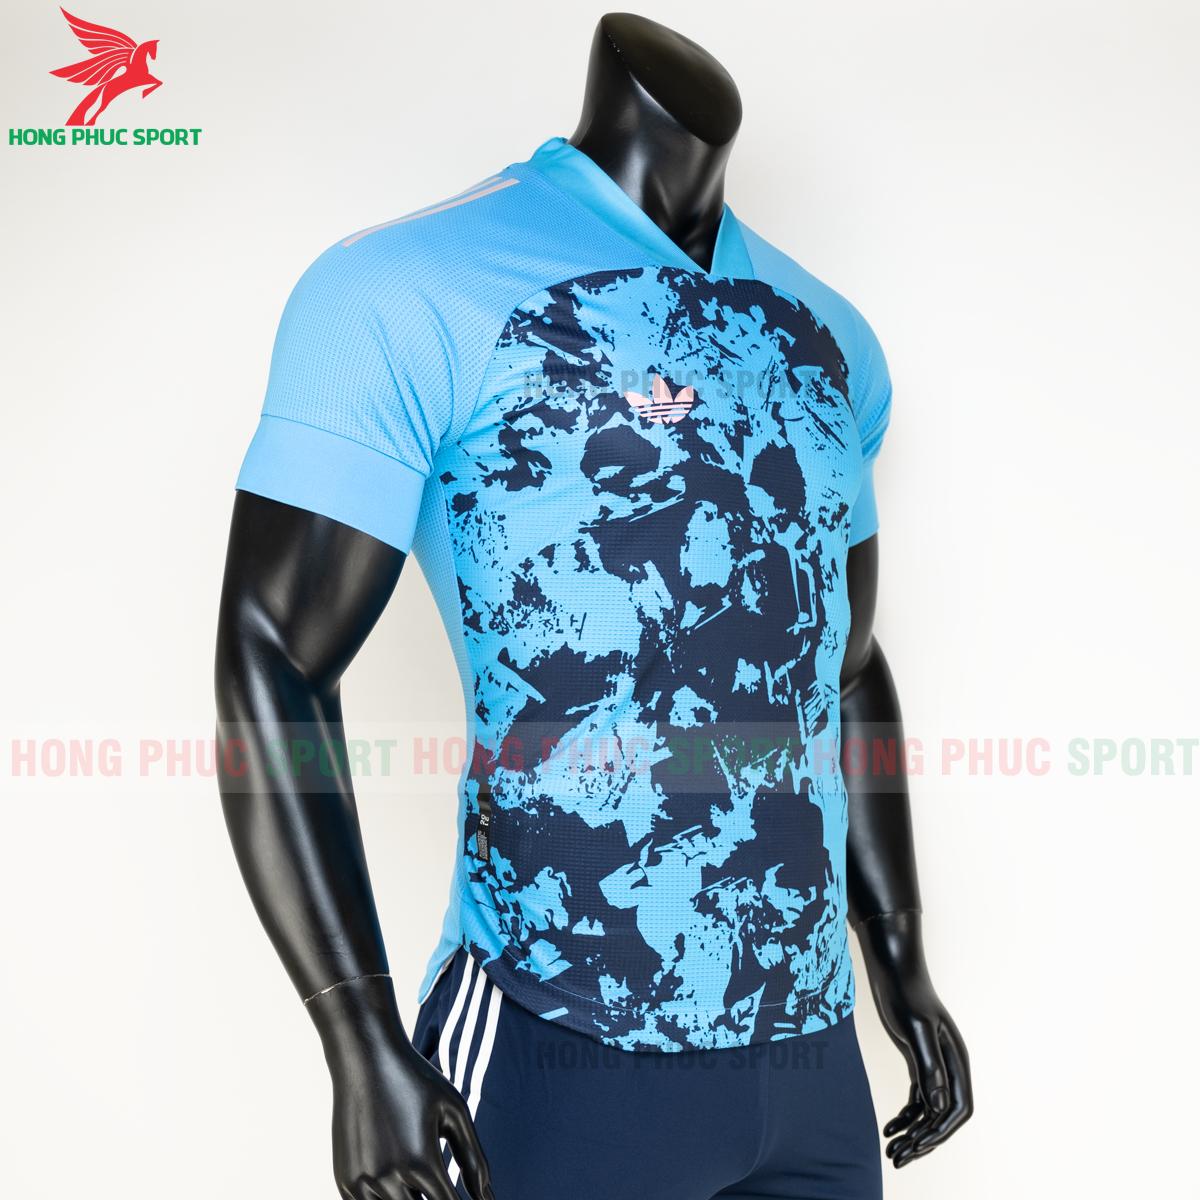 https://cdn.hongphucsport.com/unsafe/s4.shopbay.vn/files/285/ao-bong-da-condivo-template-20-21-hang-thailand-mau5-5-5fae5506bd576.png